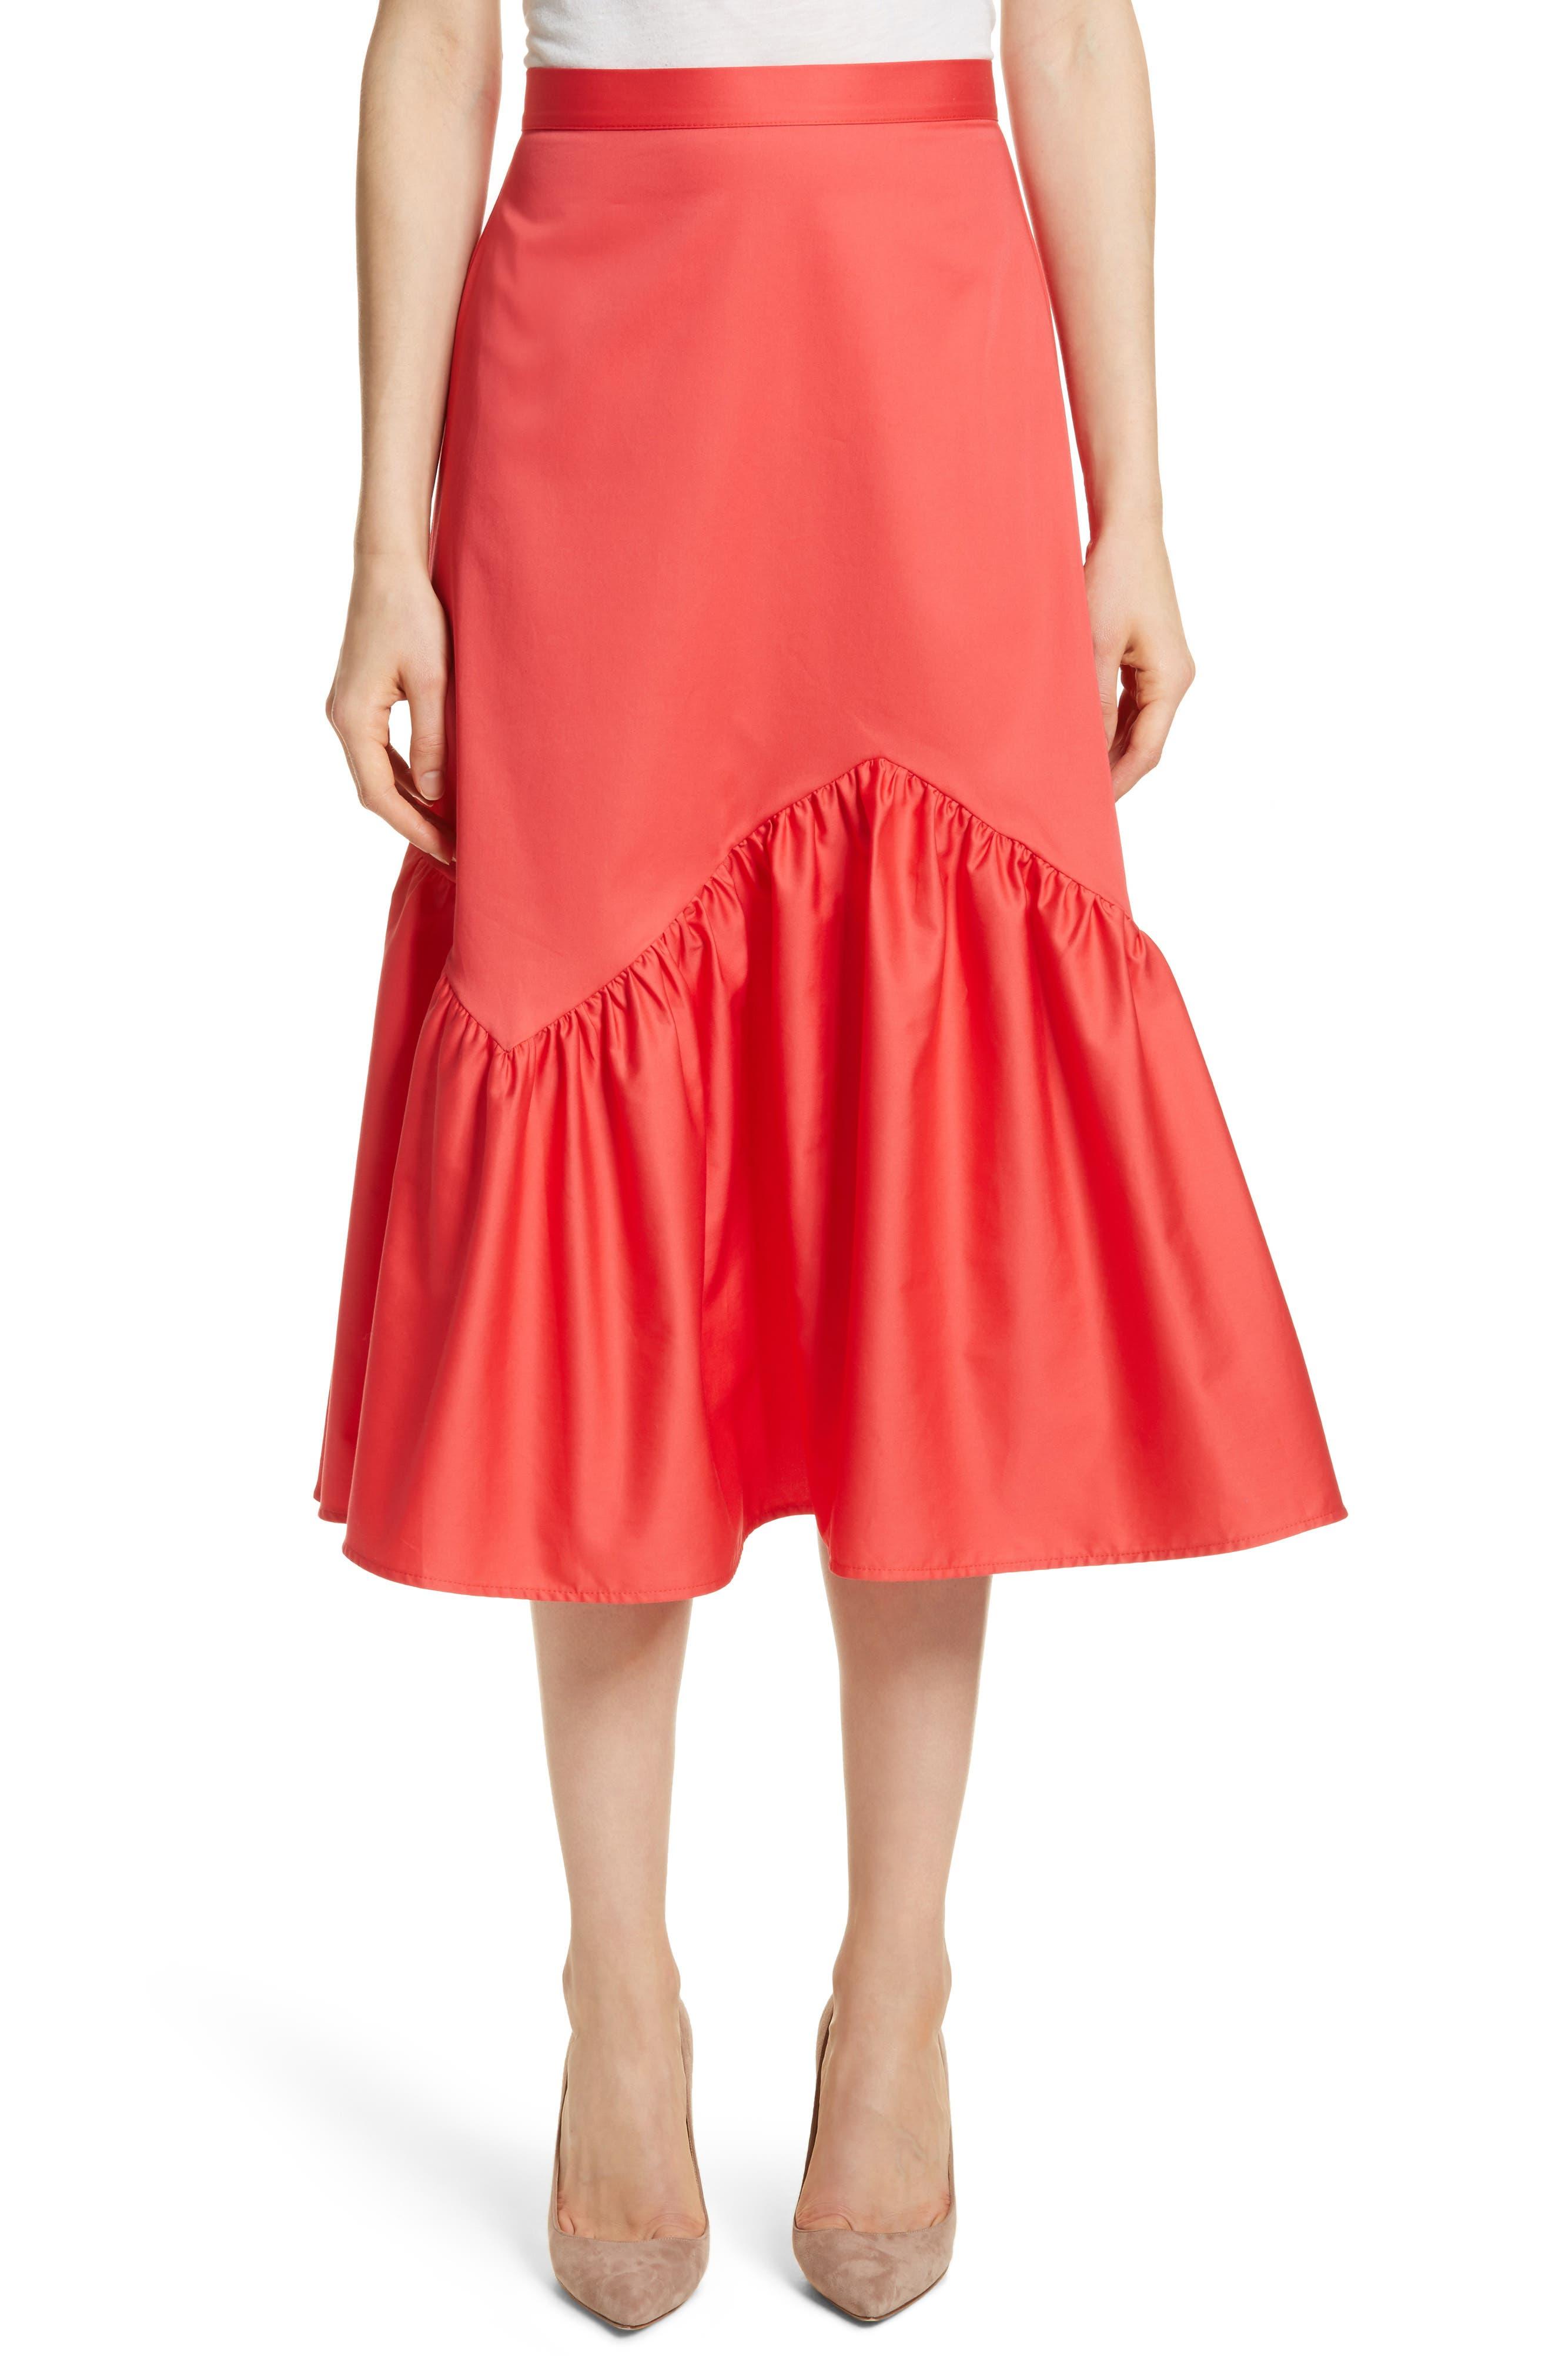 Prose & Poetry Tyra Midi Skirt,                         Main,                         color, Watermelon